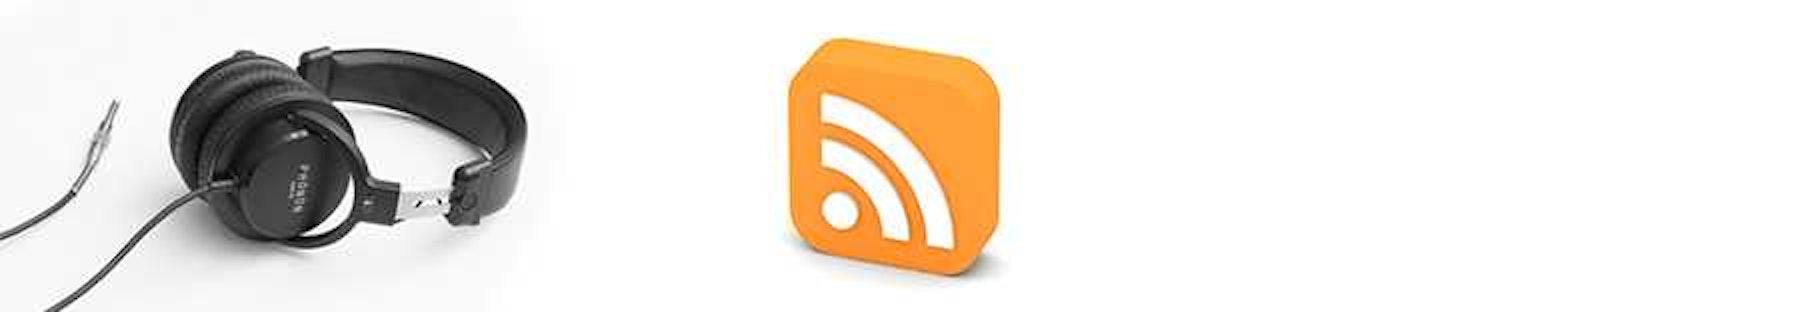 Podcast Episode 101 - Special Edition w/ Jason Jones